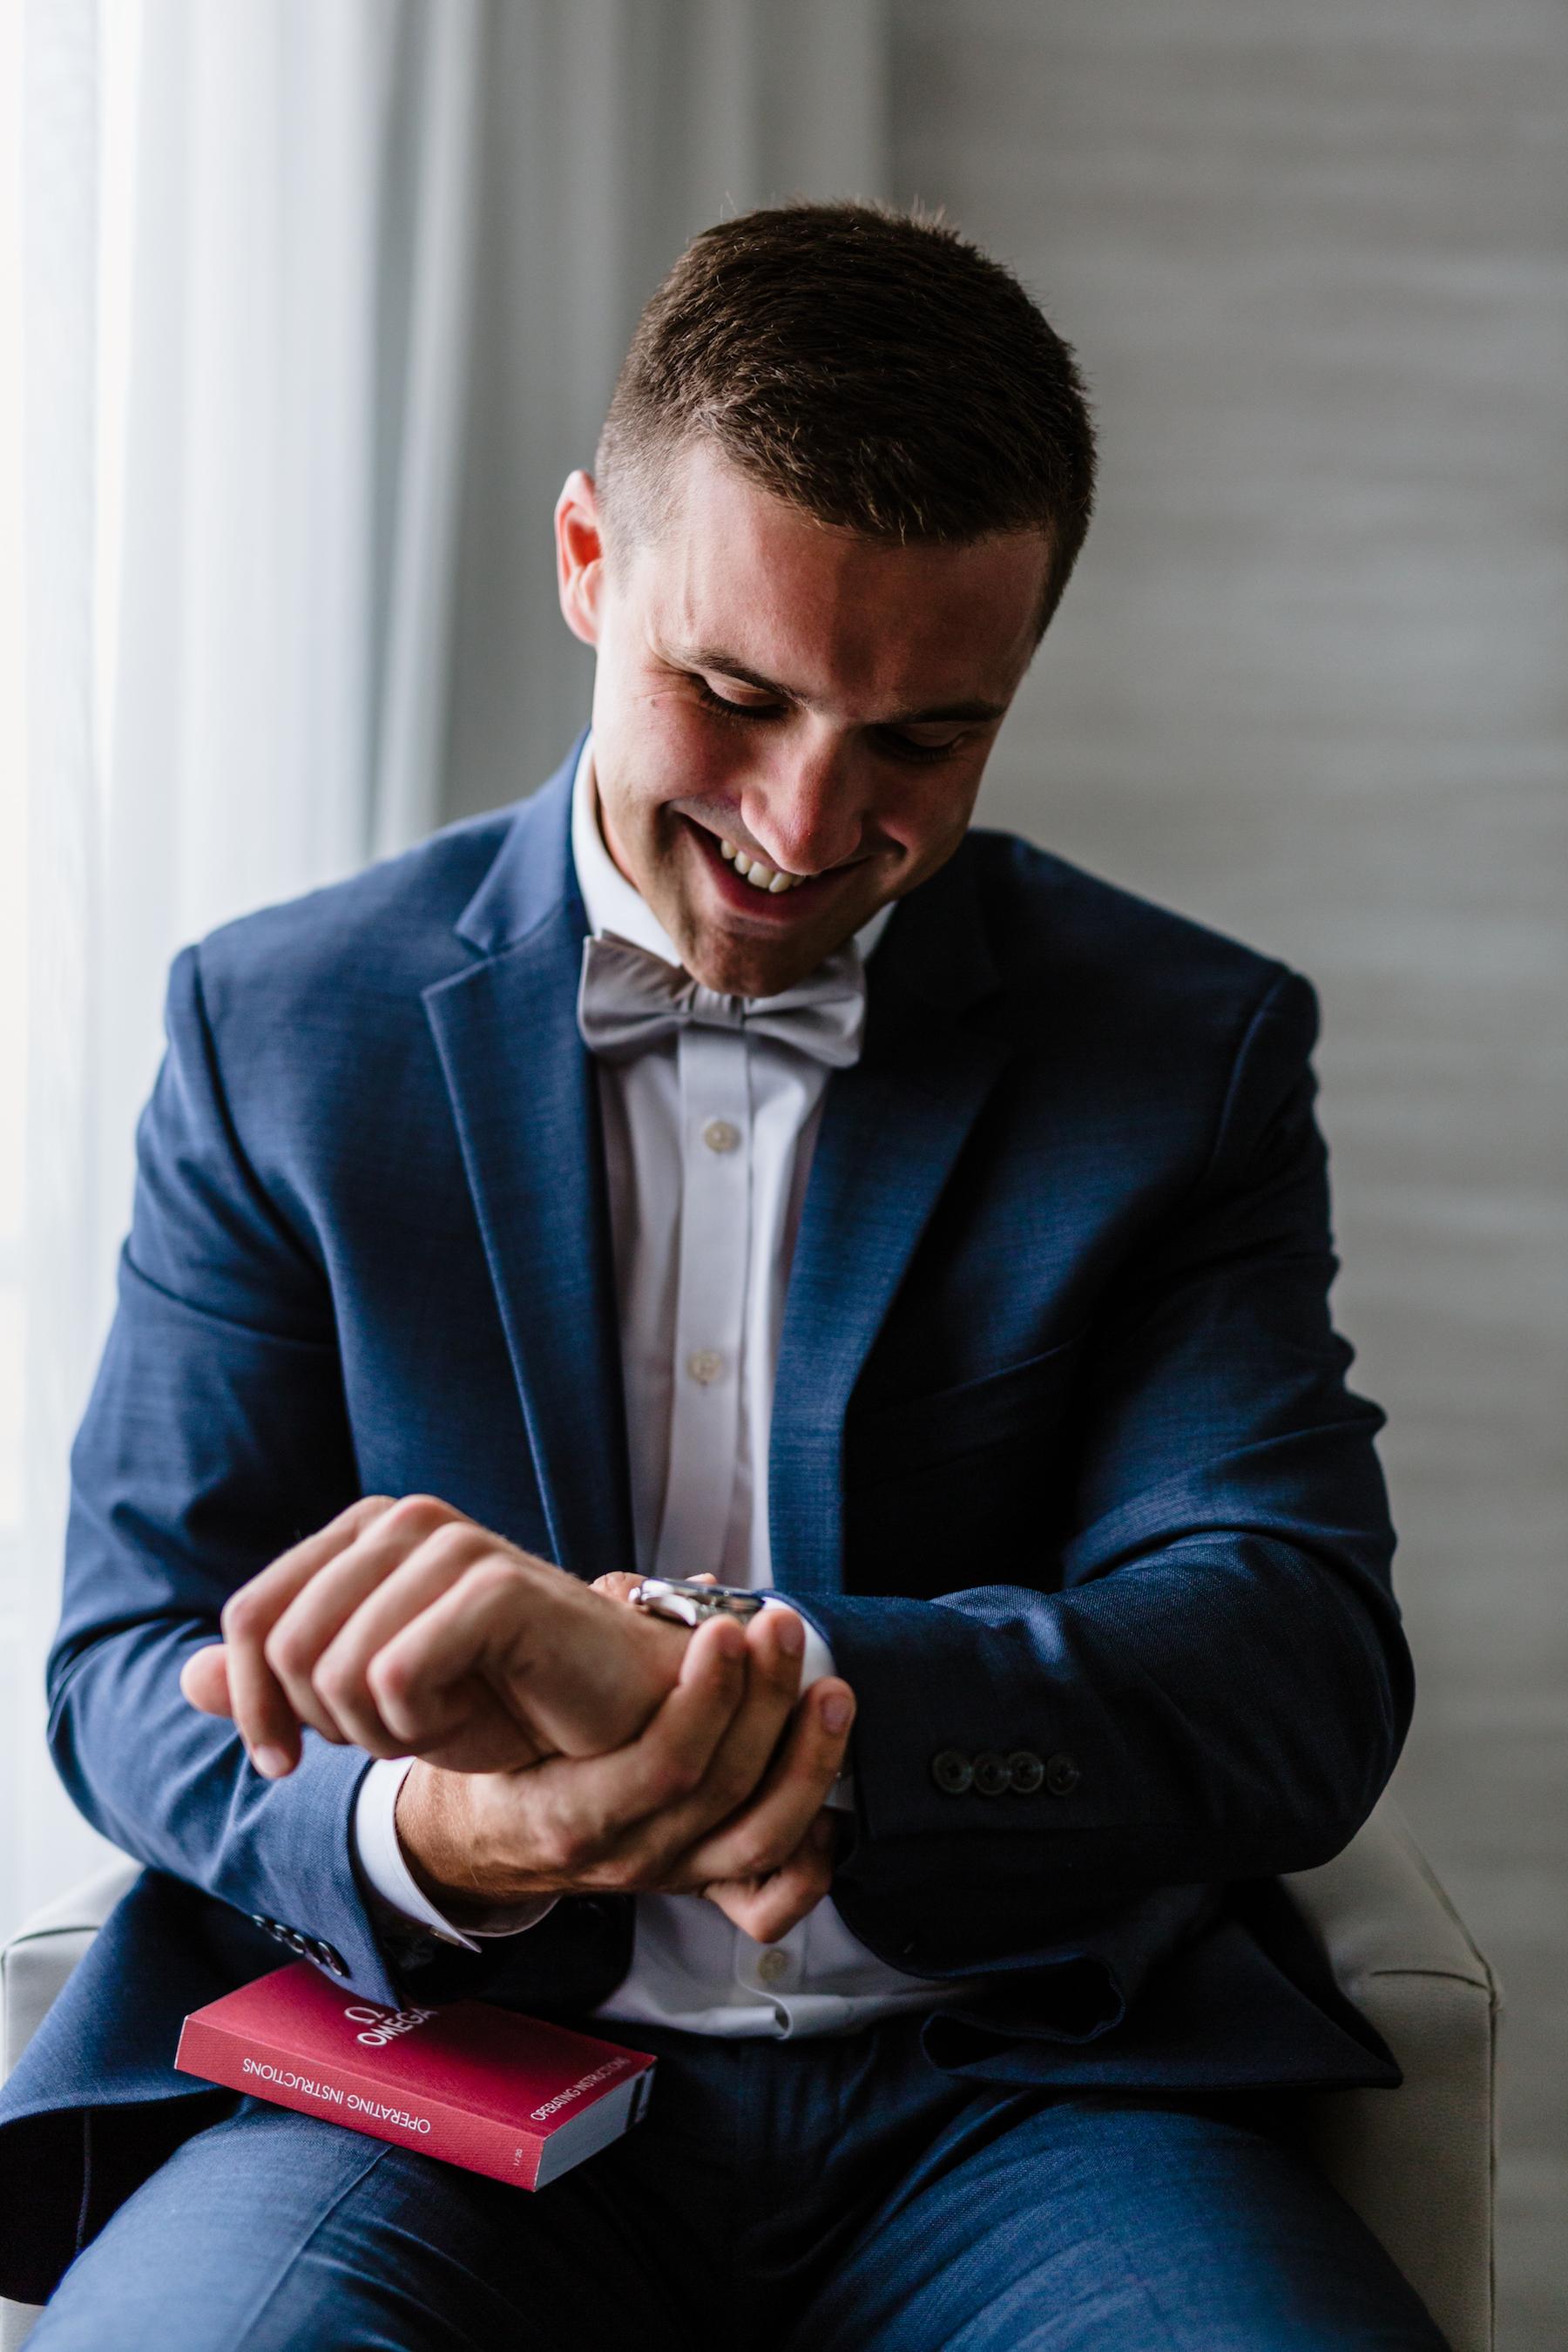 wedding-engagement-photographer-spartanburg-greenville-columbia-carolina-south-north-439.JPG